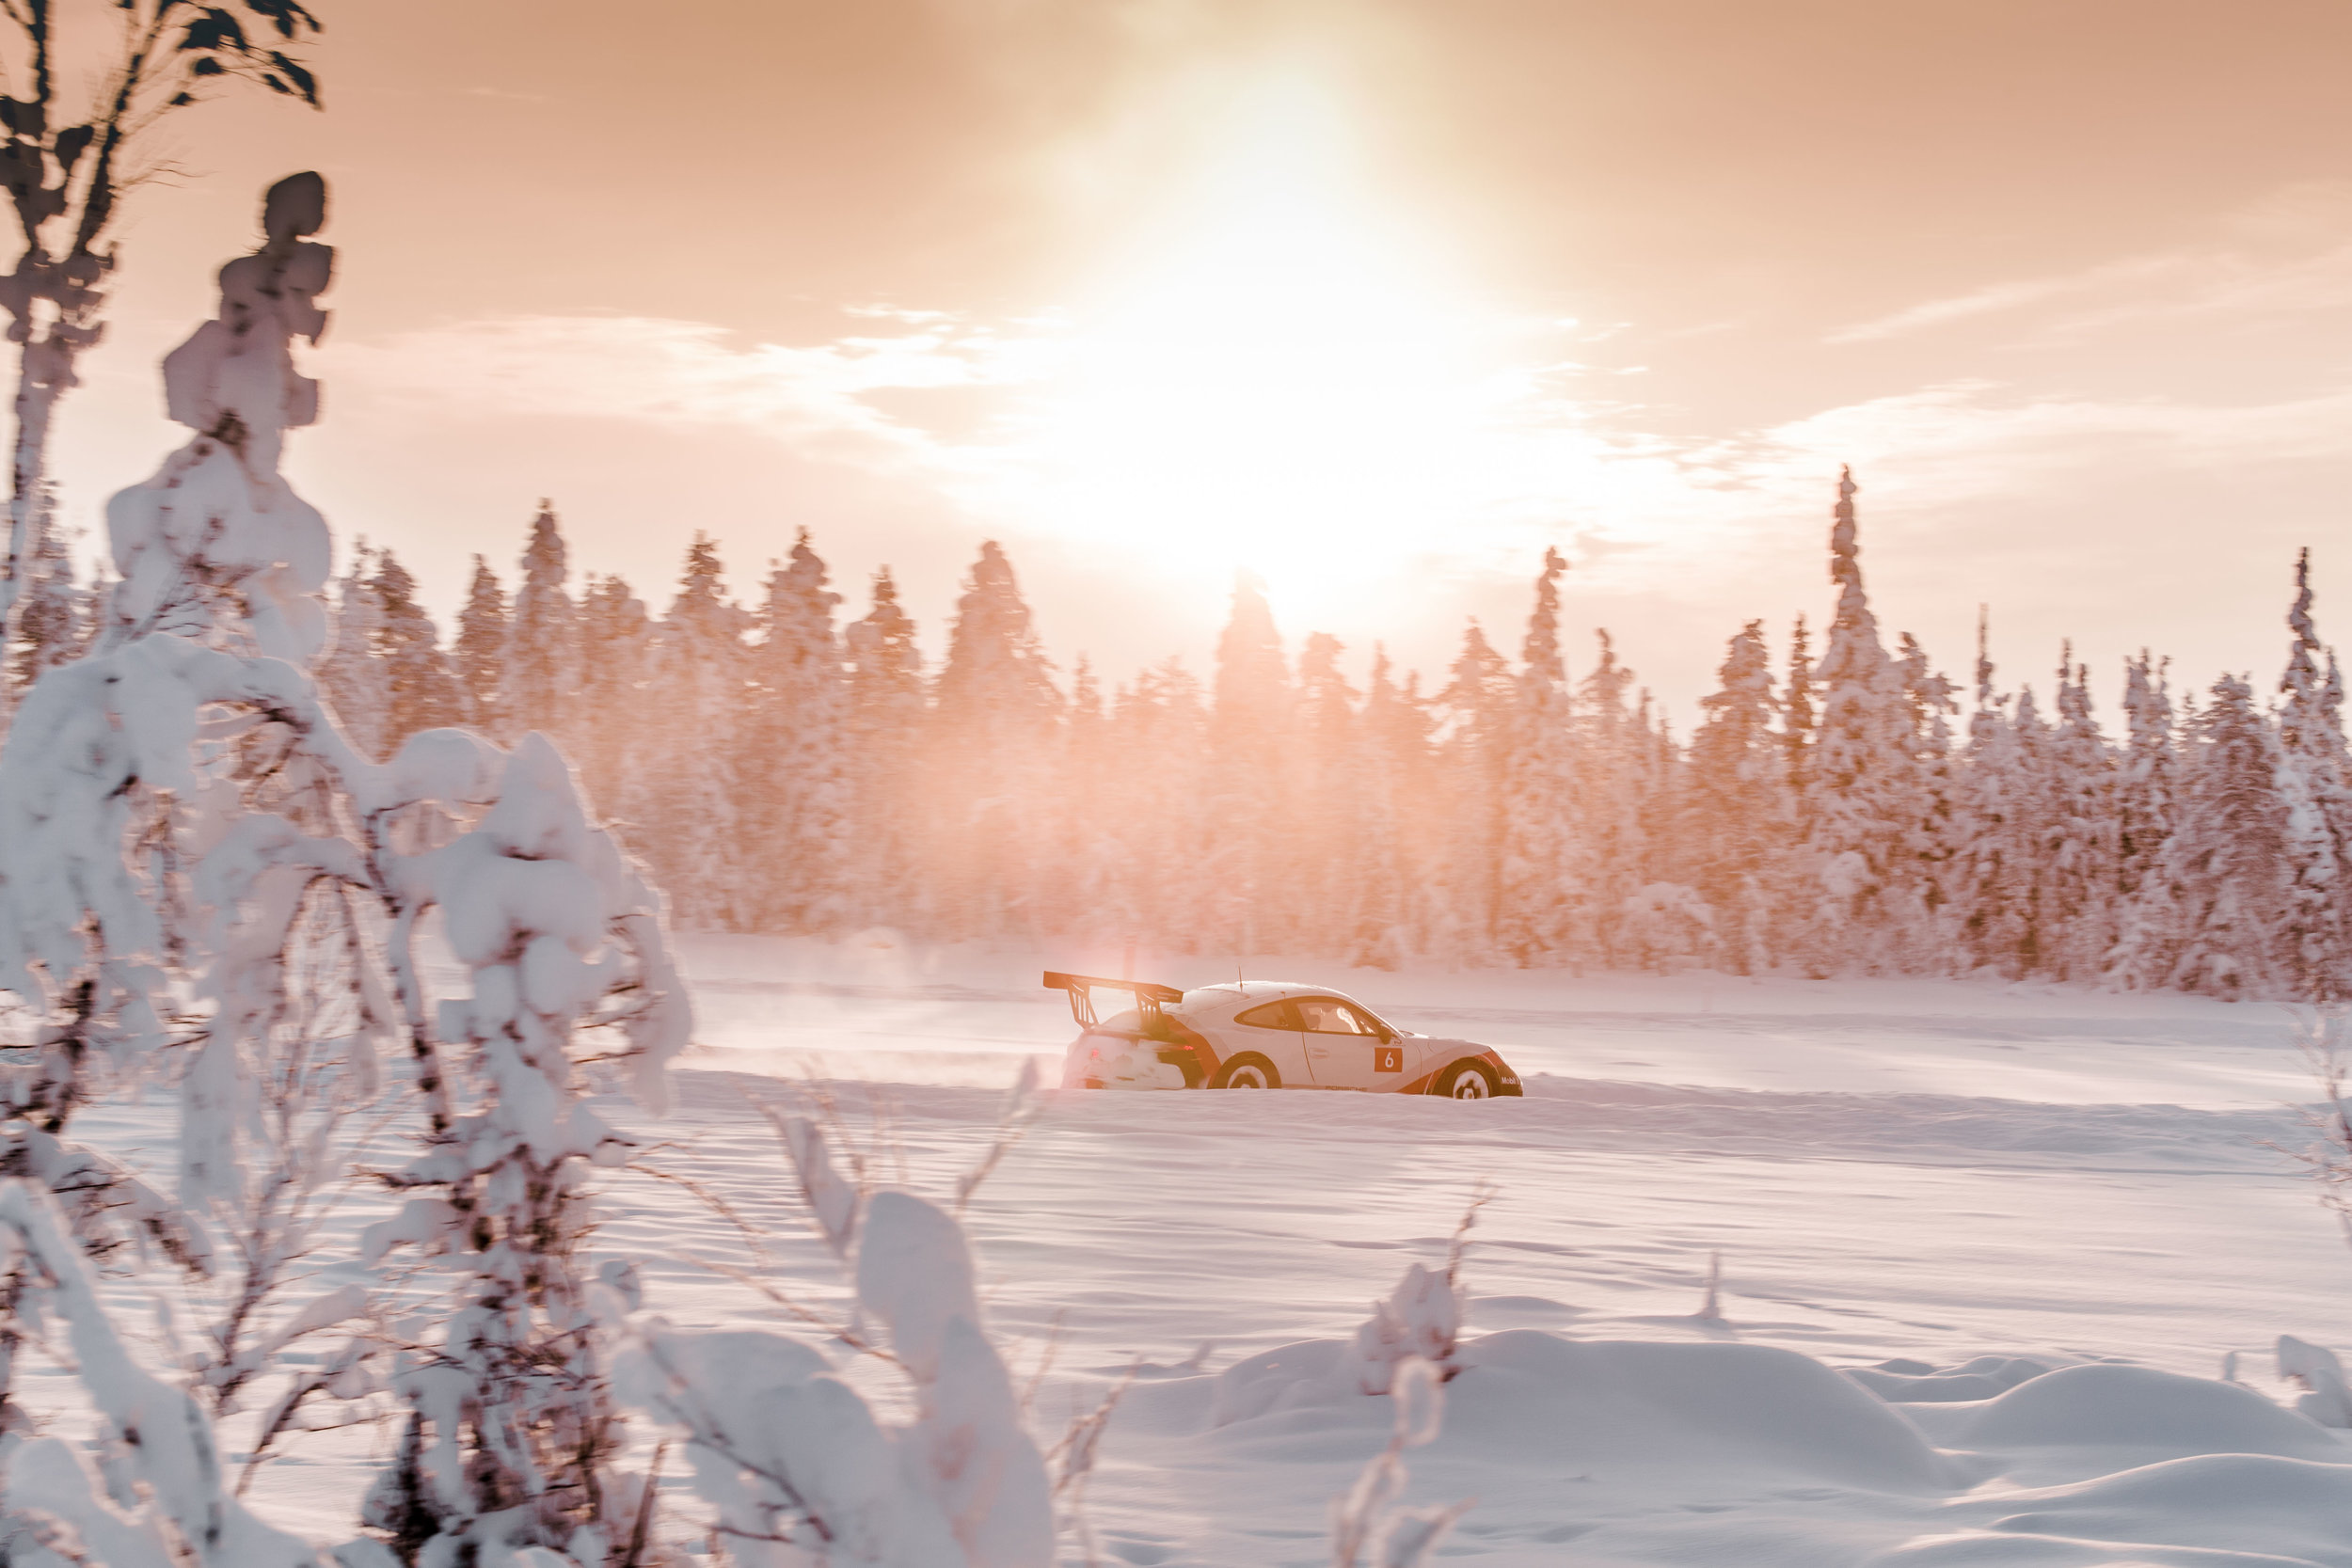 Porsche Ice Experience on Ice_30_01_2019_0985_175766.jpg